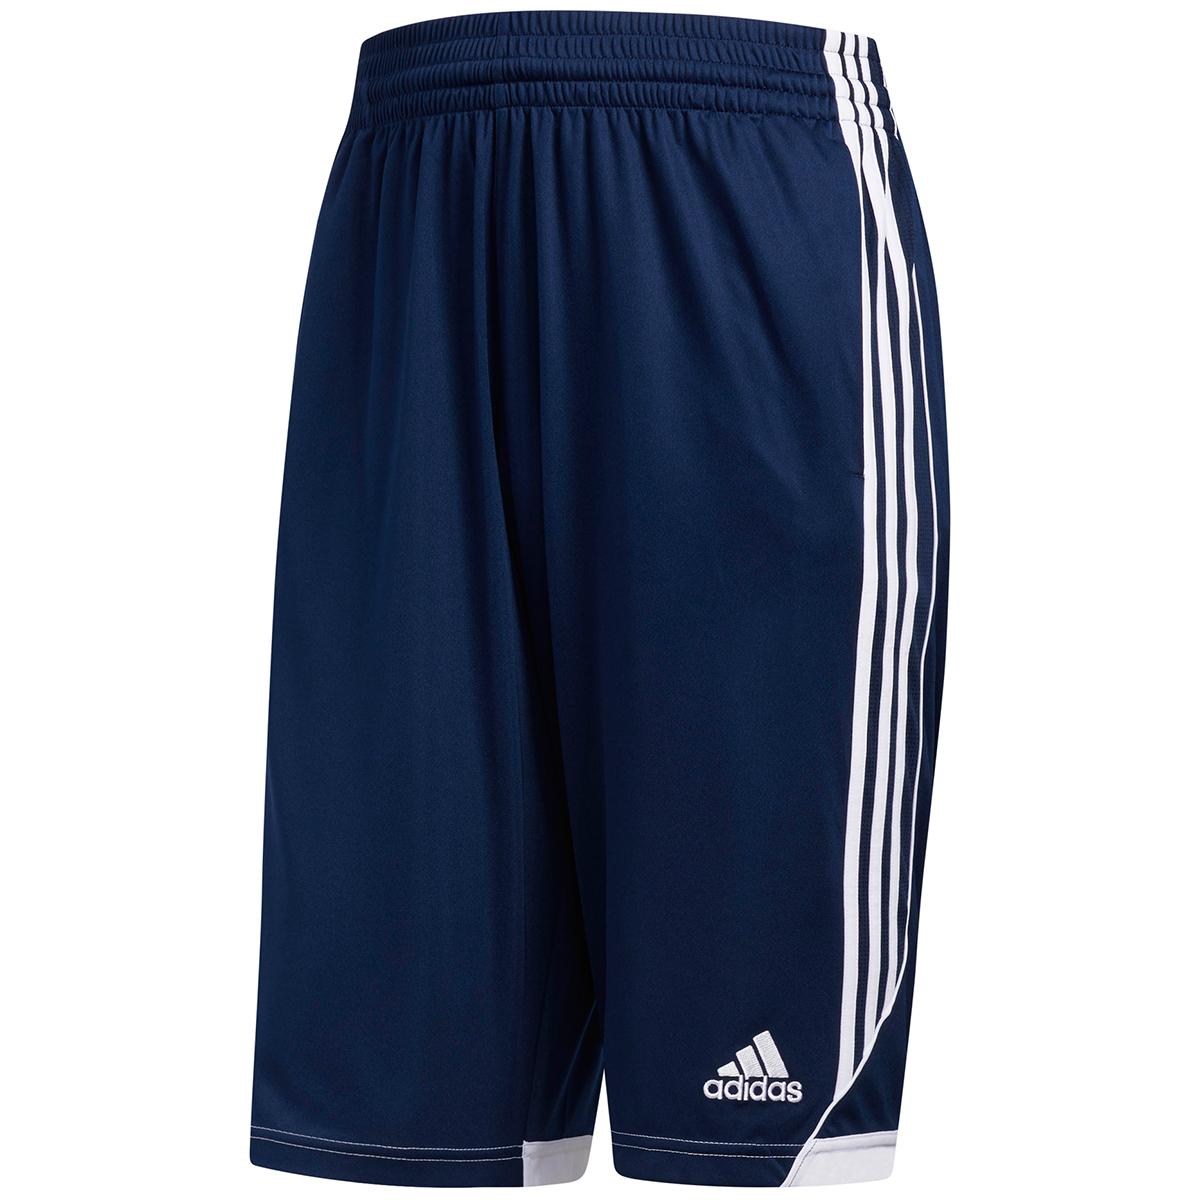 Adidas Men's 3G Speed Basketball Shorts - Blue, XXL